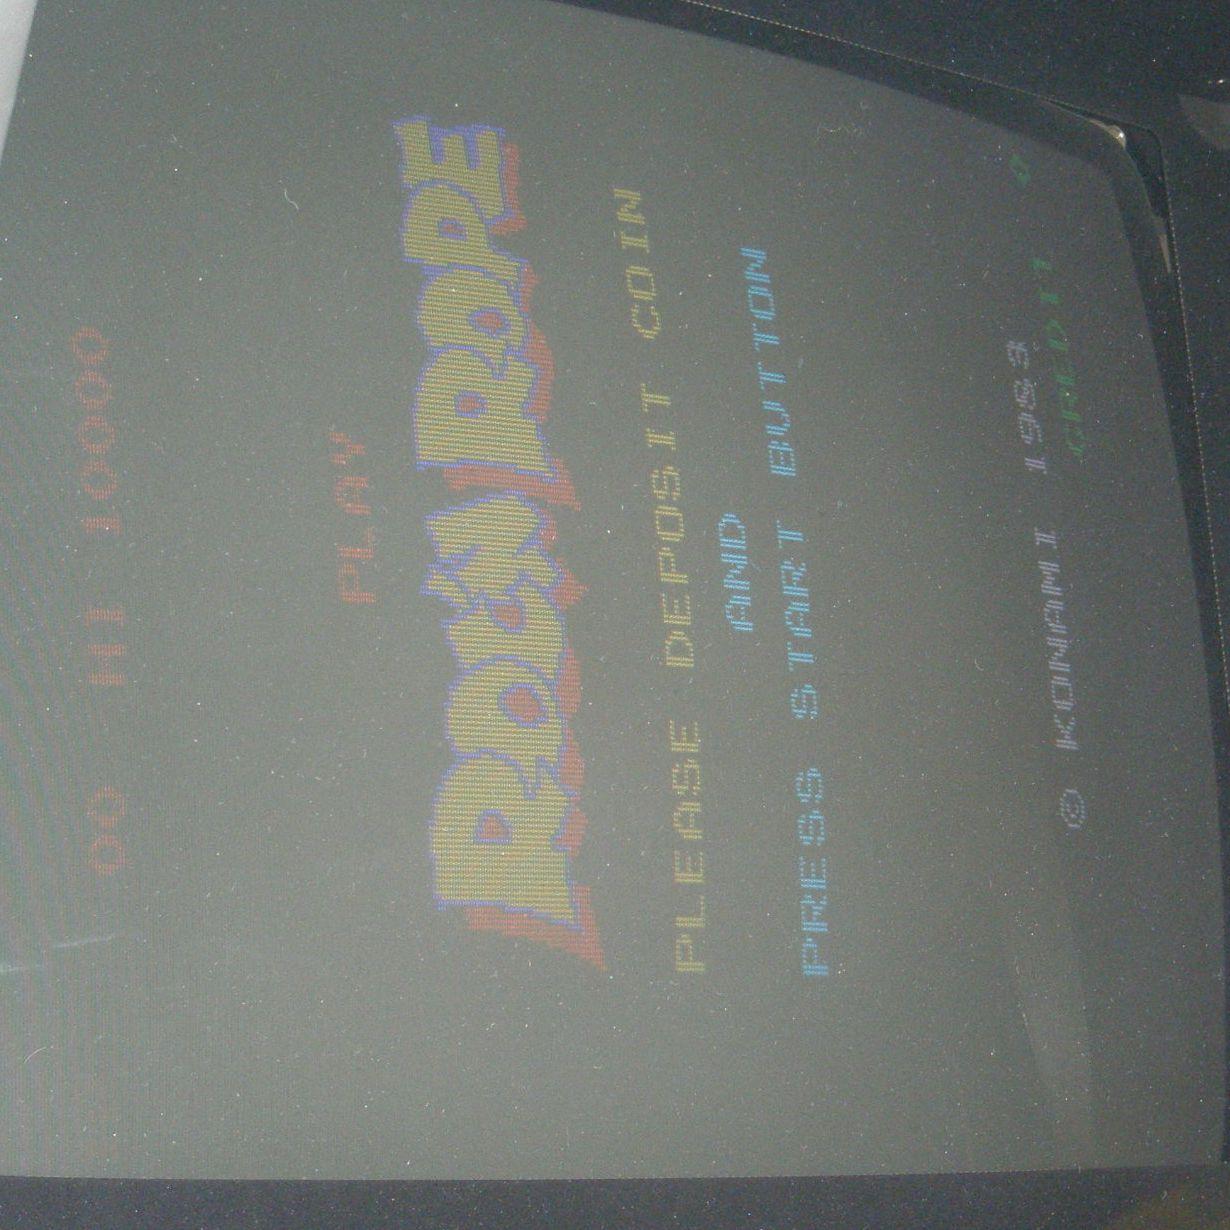 http://arcadius.esero.net/Arcade/Games/Non_Jamma_Fully_Working/Rock_n_Rope_04.jpg